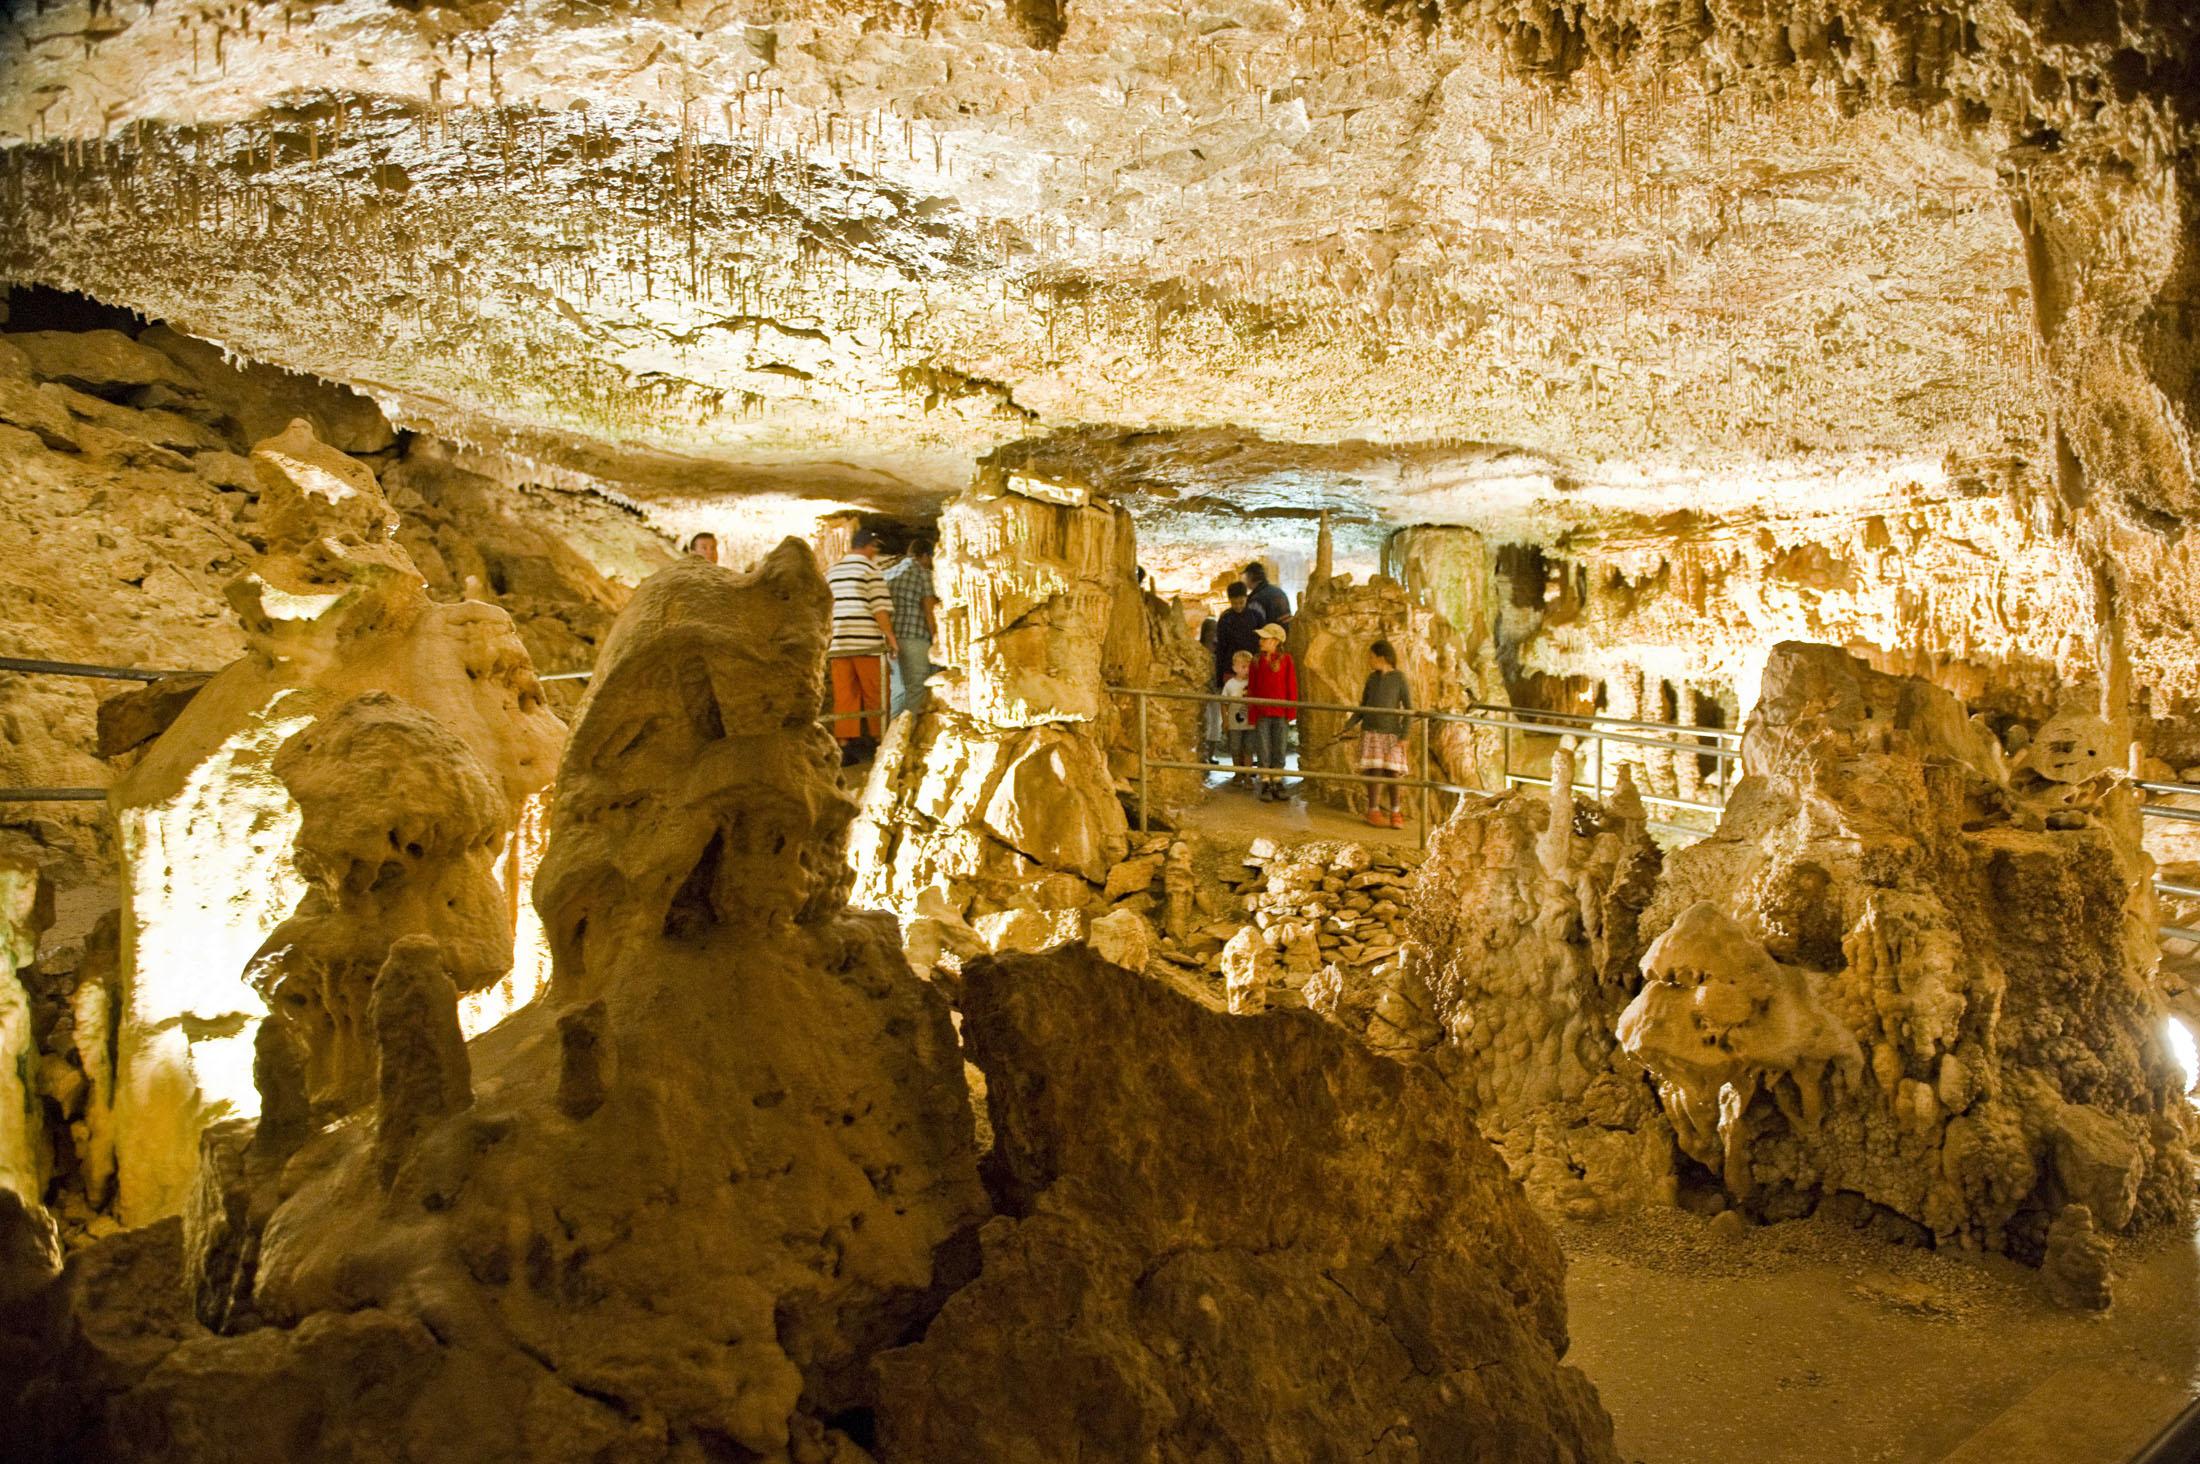 Limestone caves - Tropfsteinhöhle Velburg